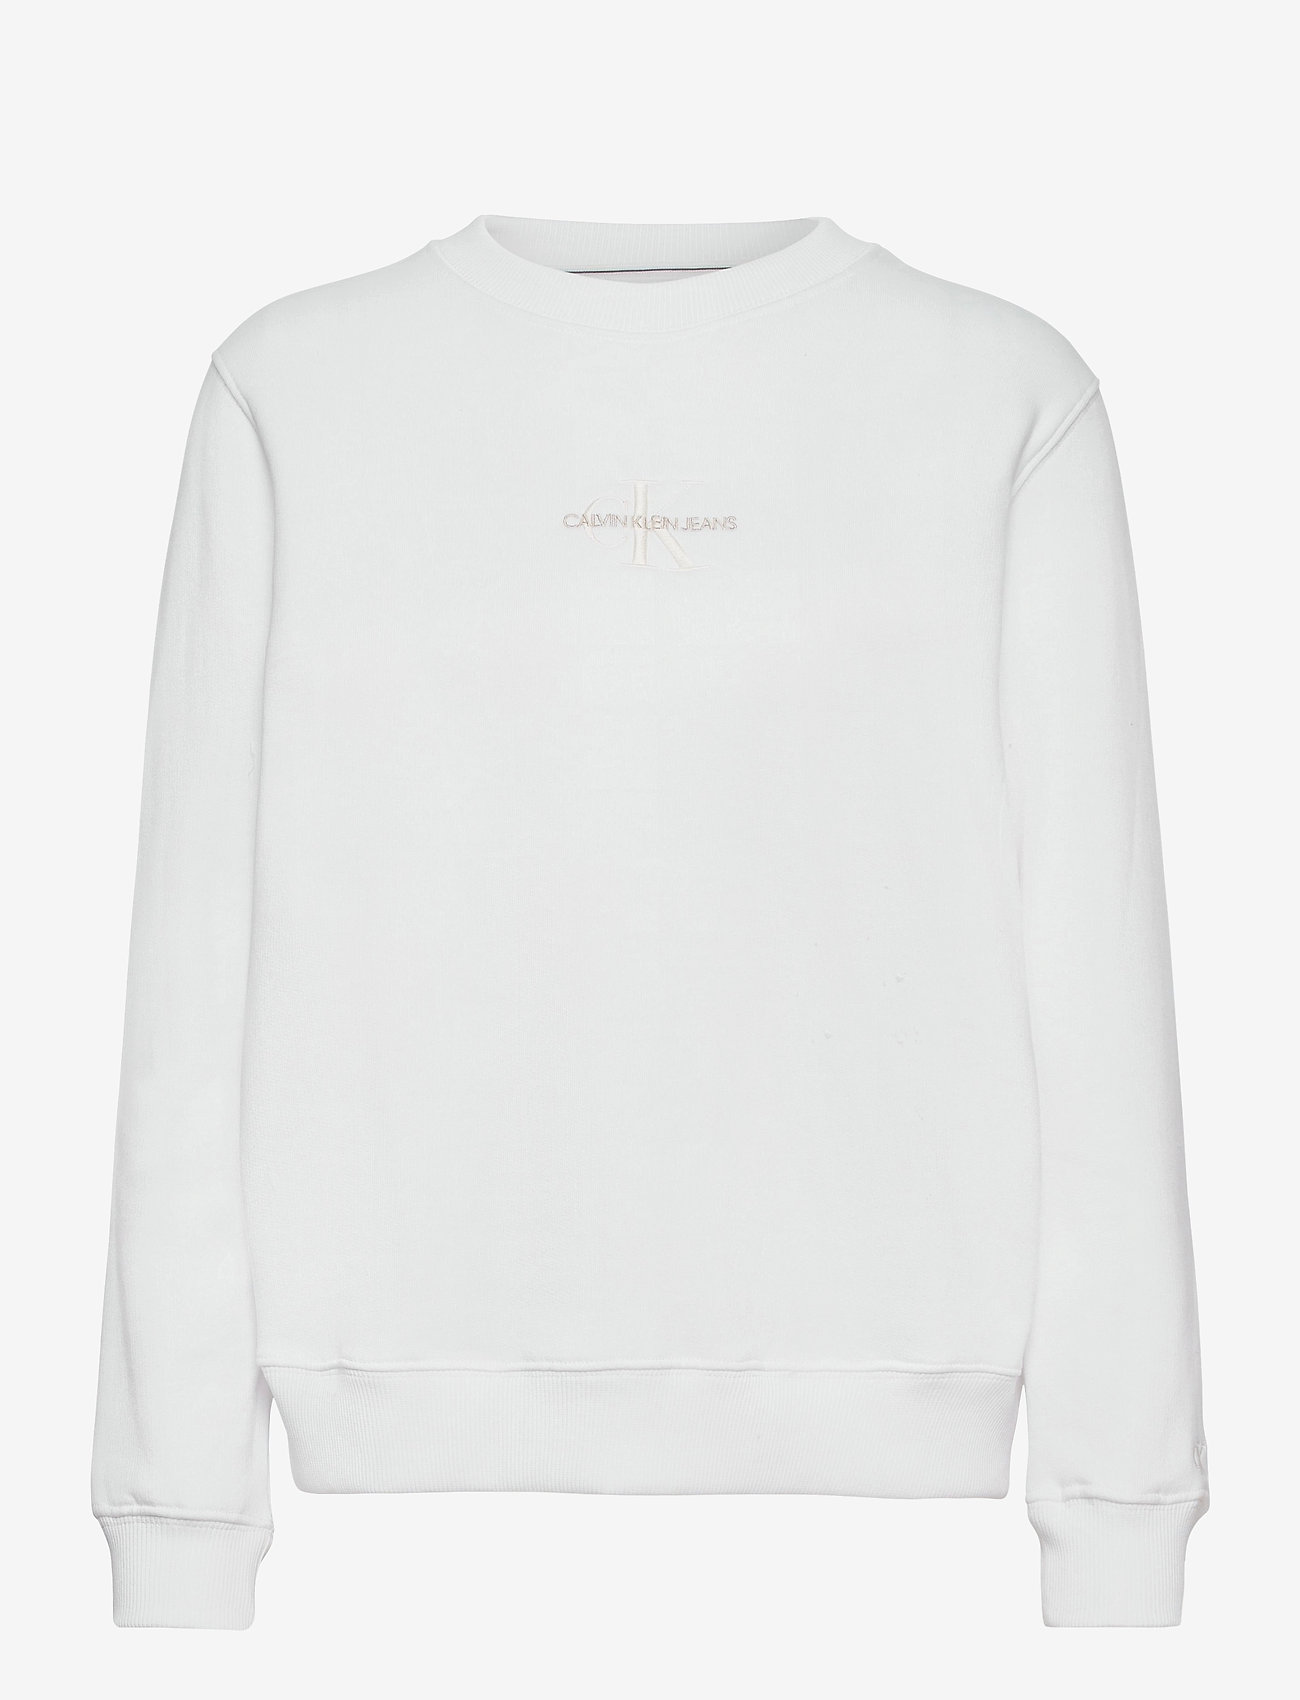 Calvin Klein Jeans - MONOGRAM LOGO CREW NECK - sweatshirts - bright white - 0